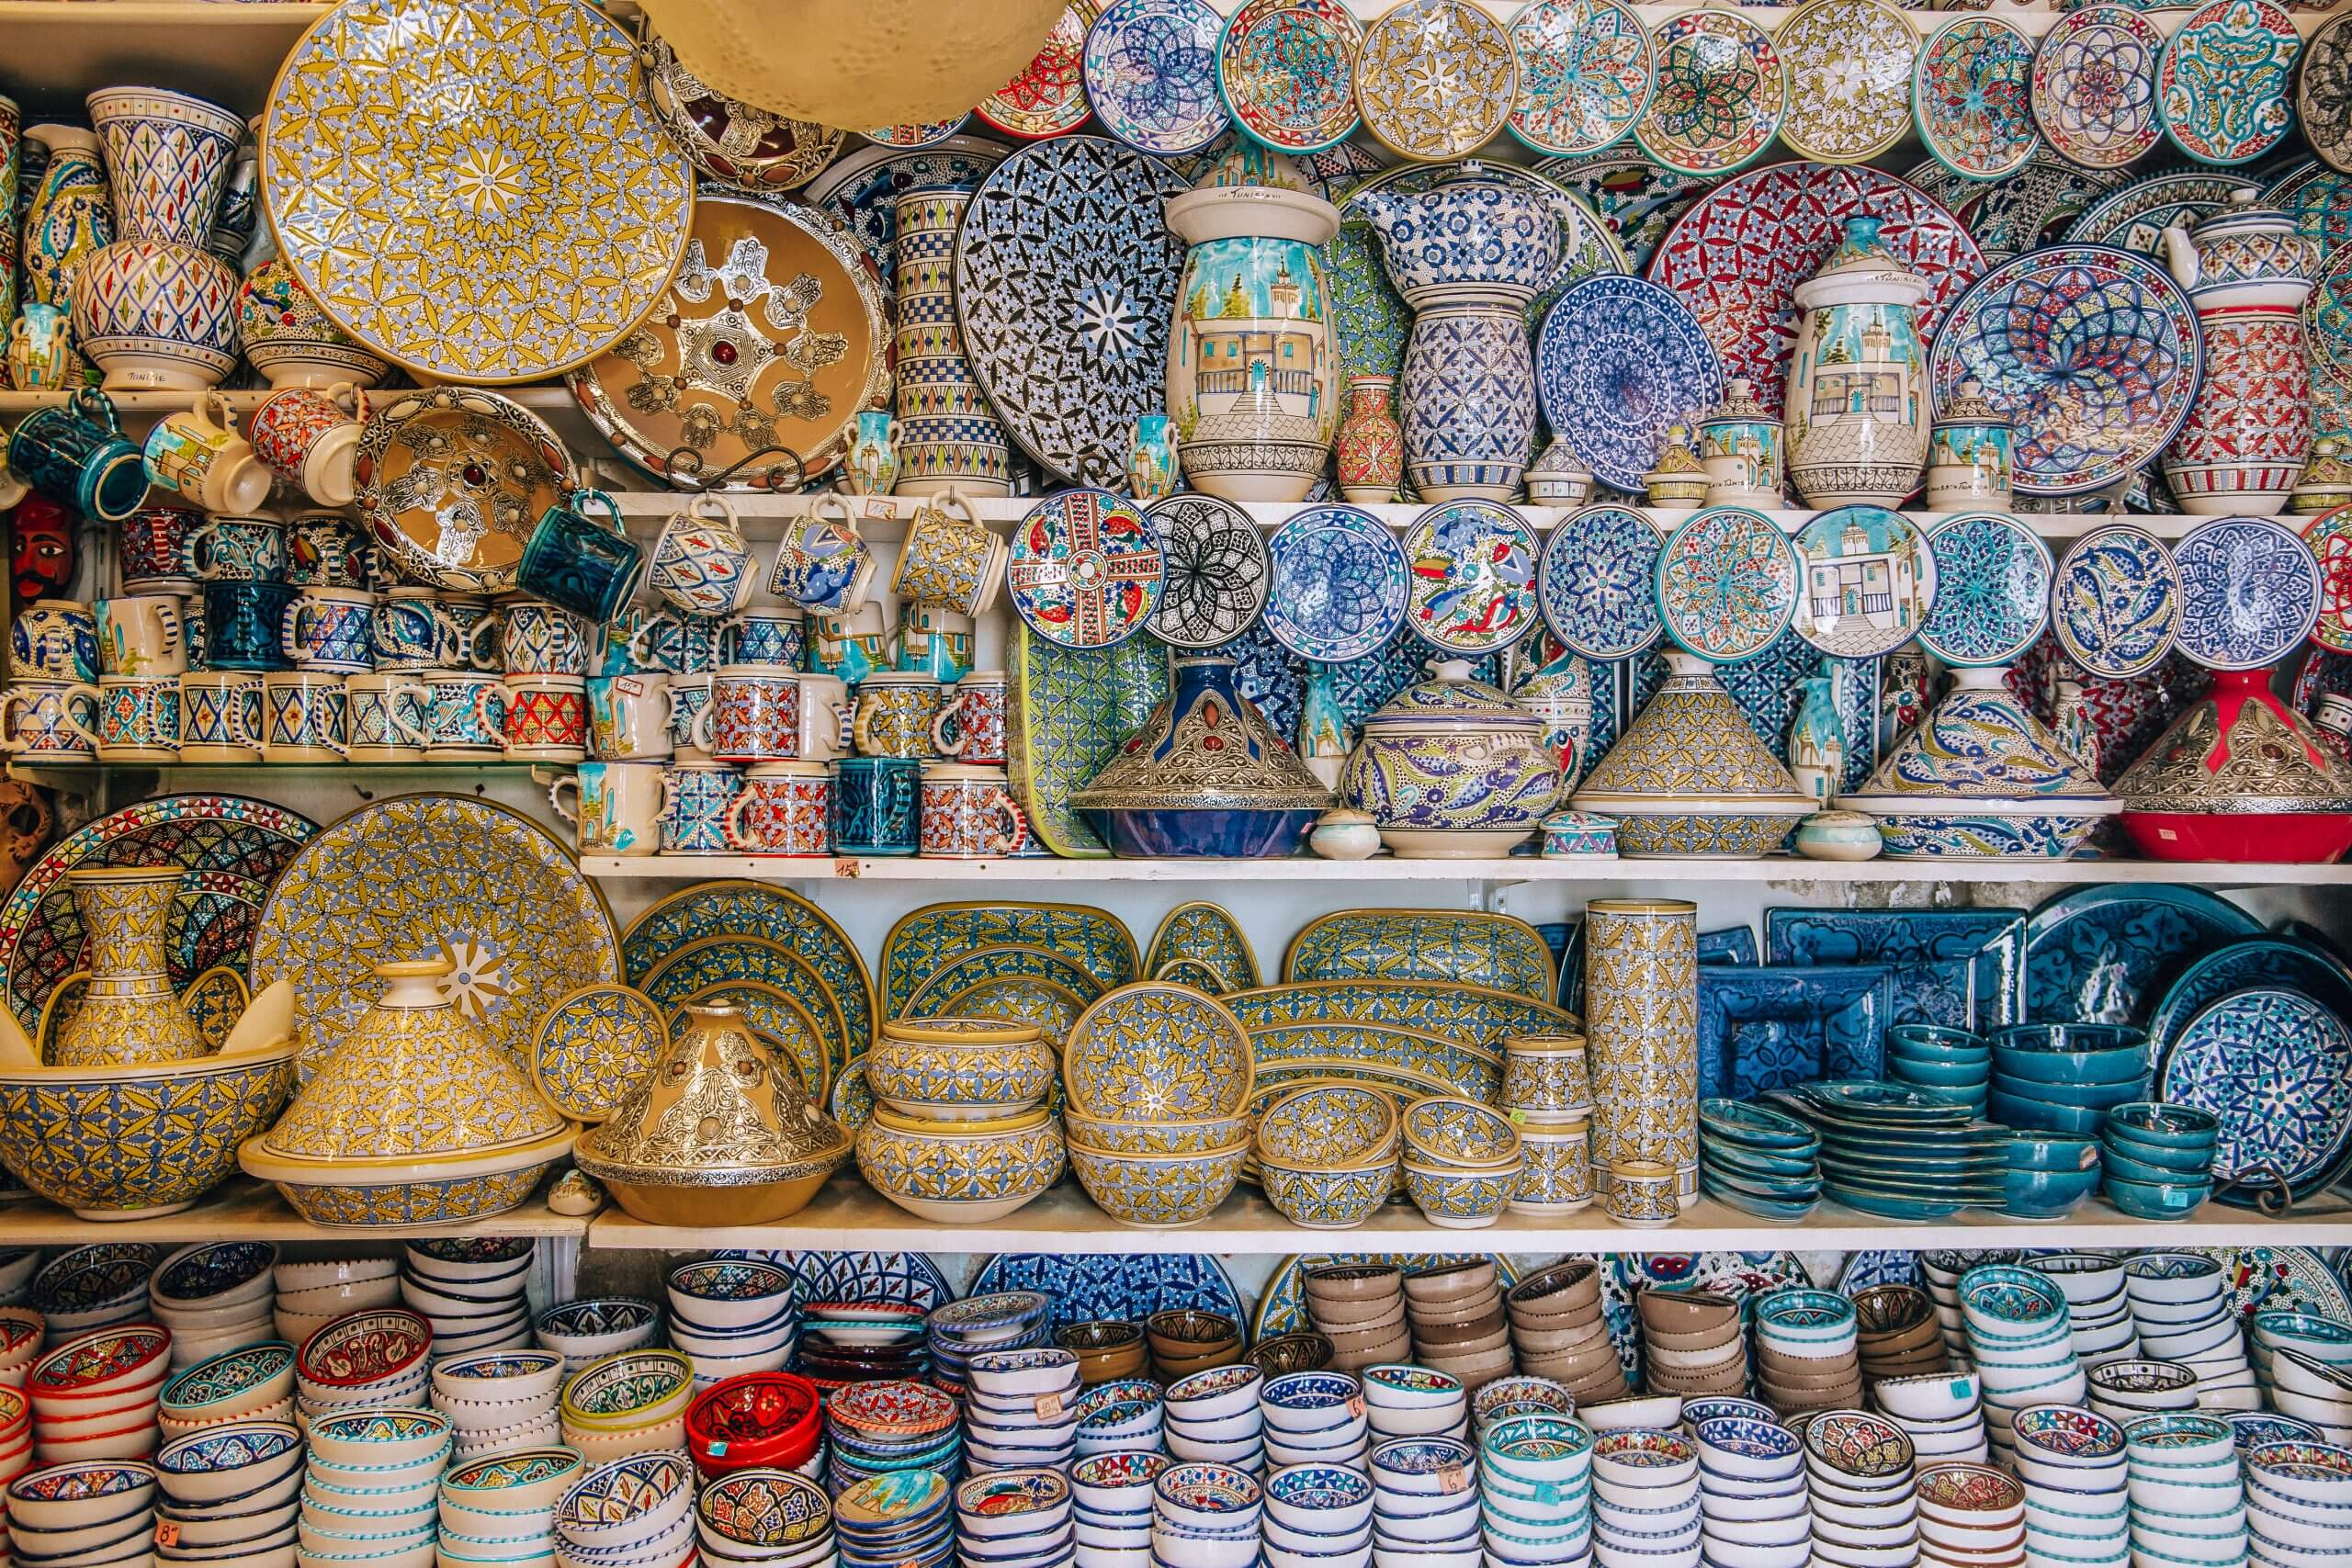 die größte Auswahl an bemalten Keramiken